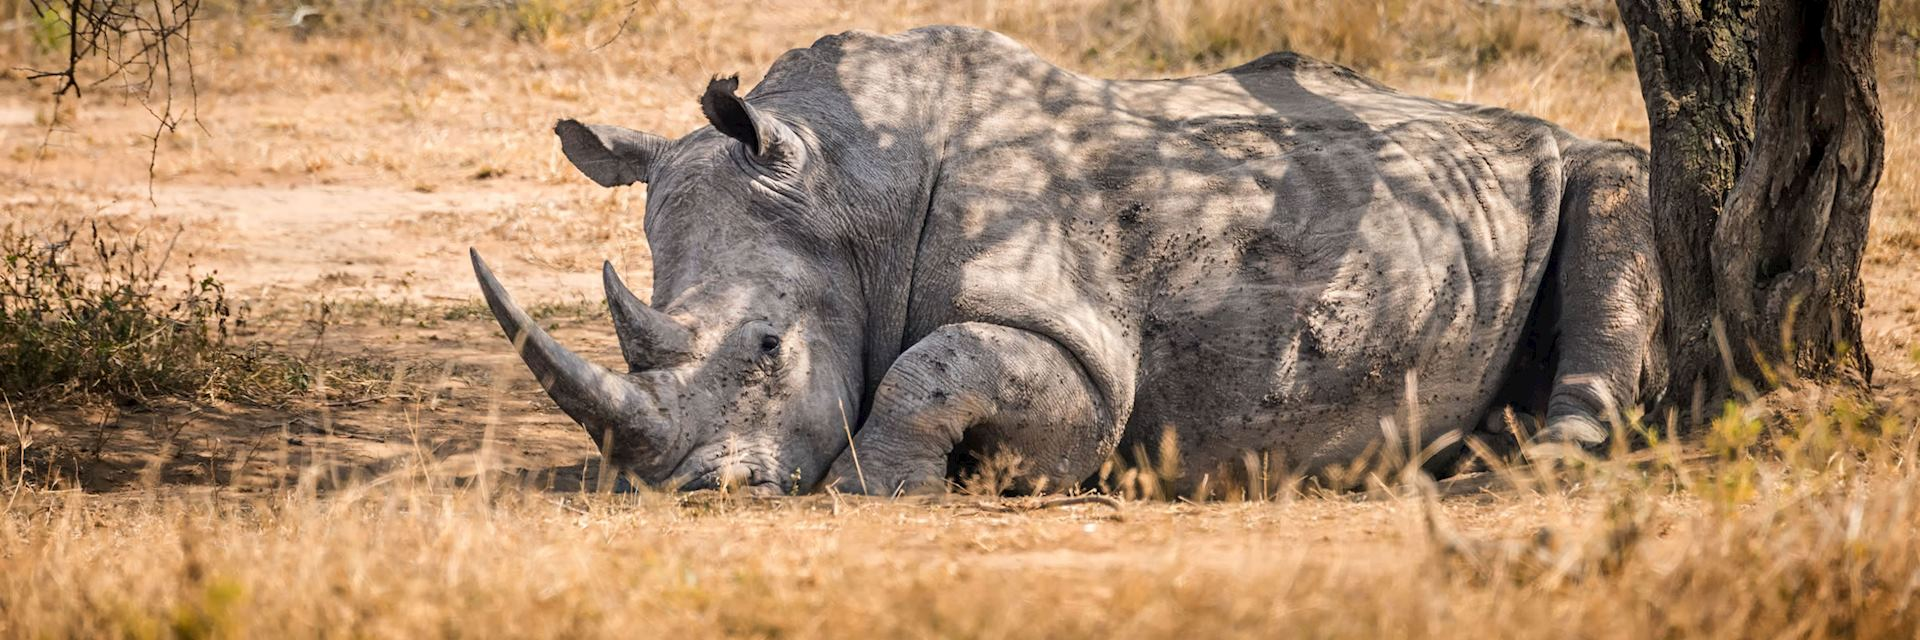 White rhino, Mlilwane National Park, Eswatini